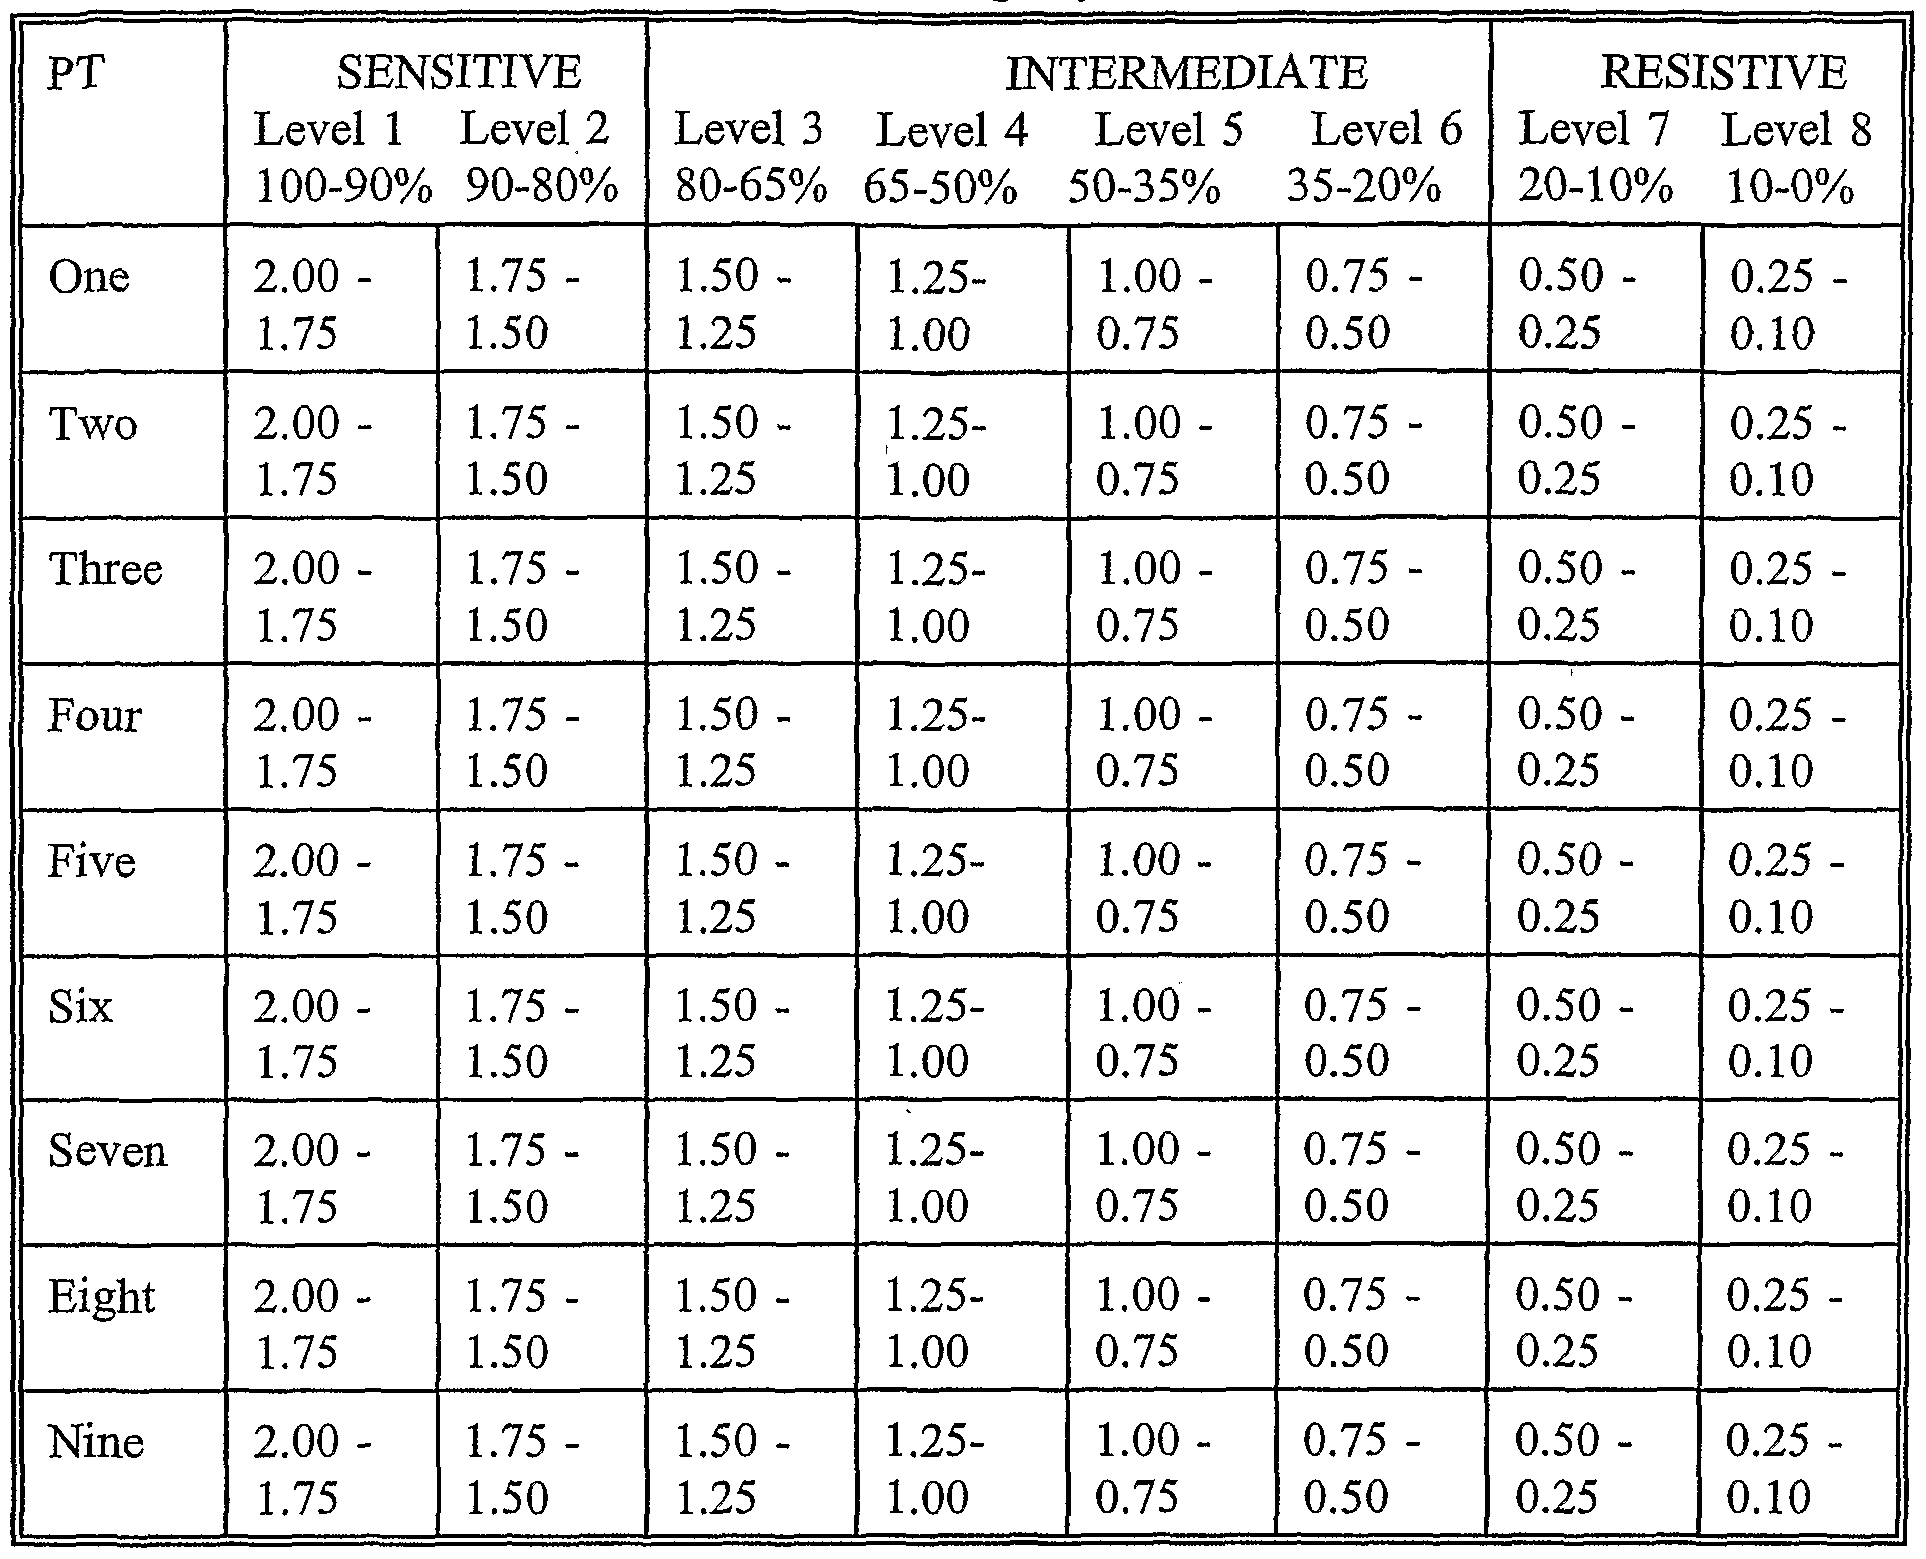 Negative Z Score Table